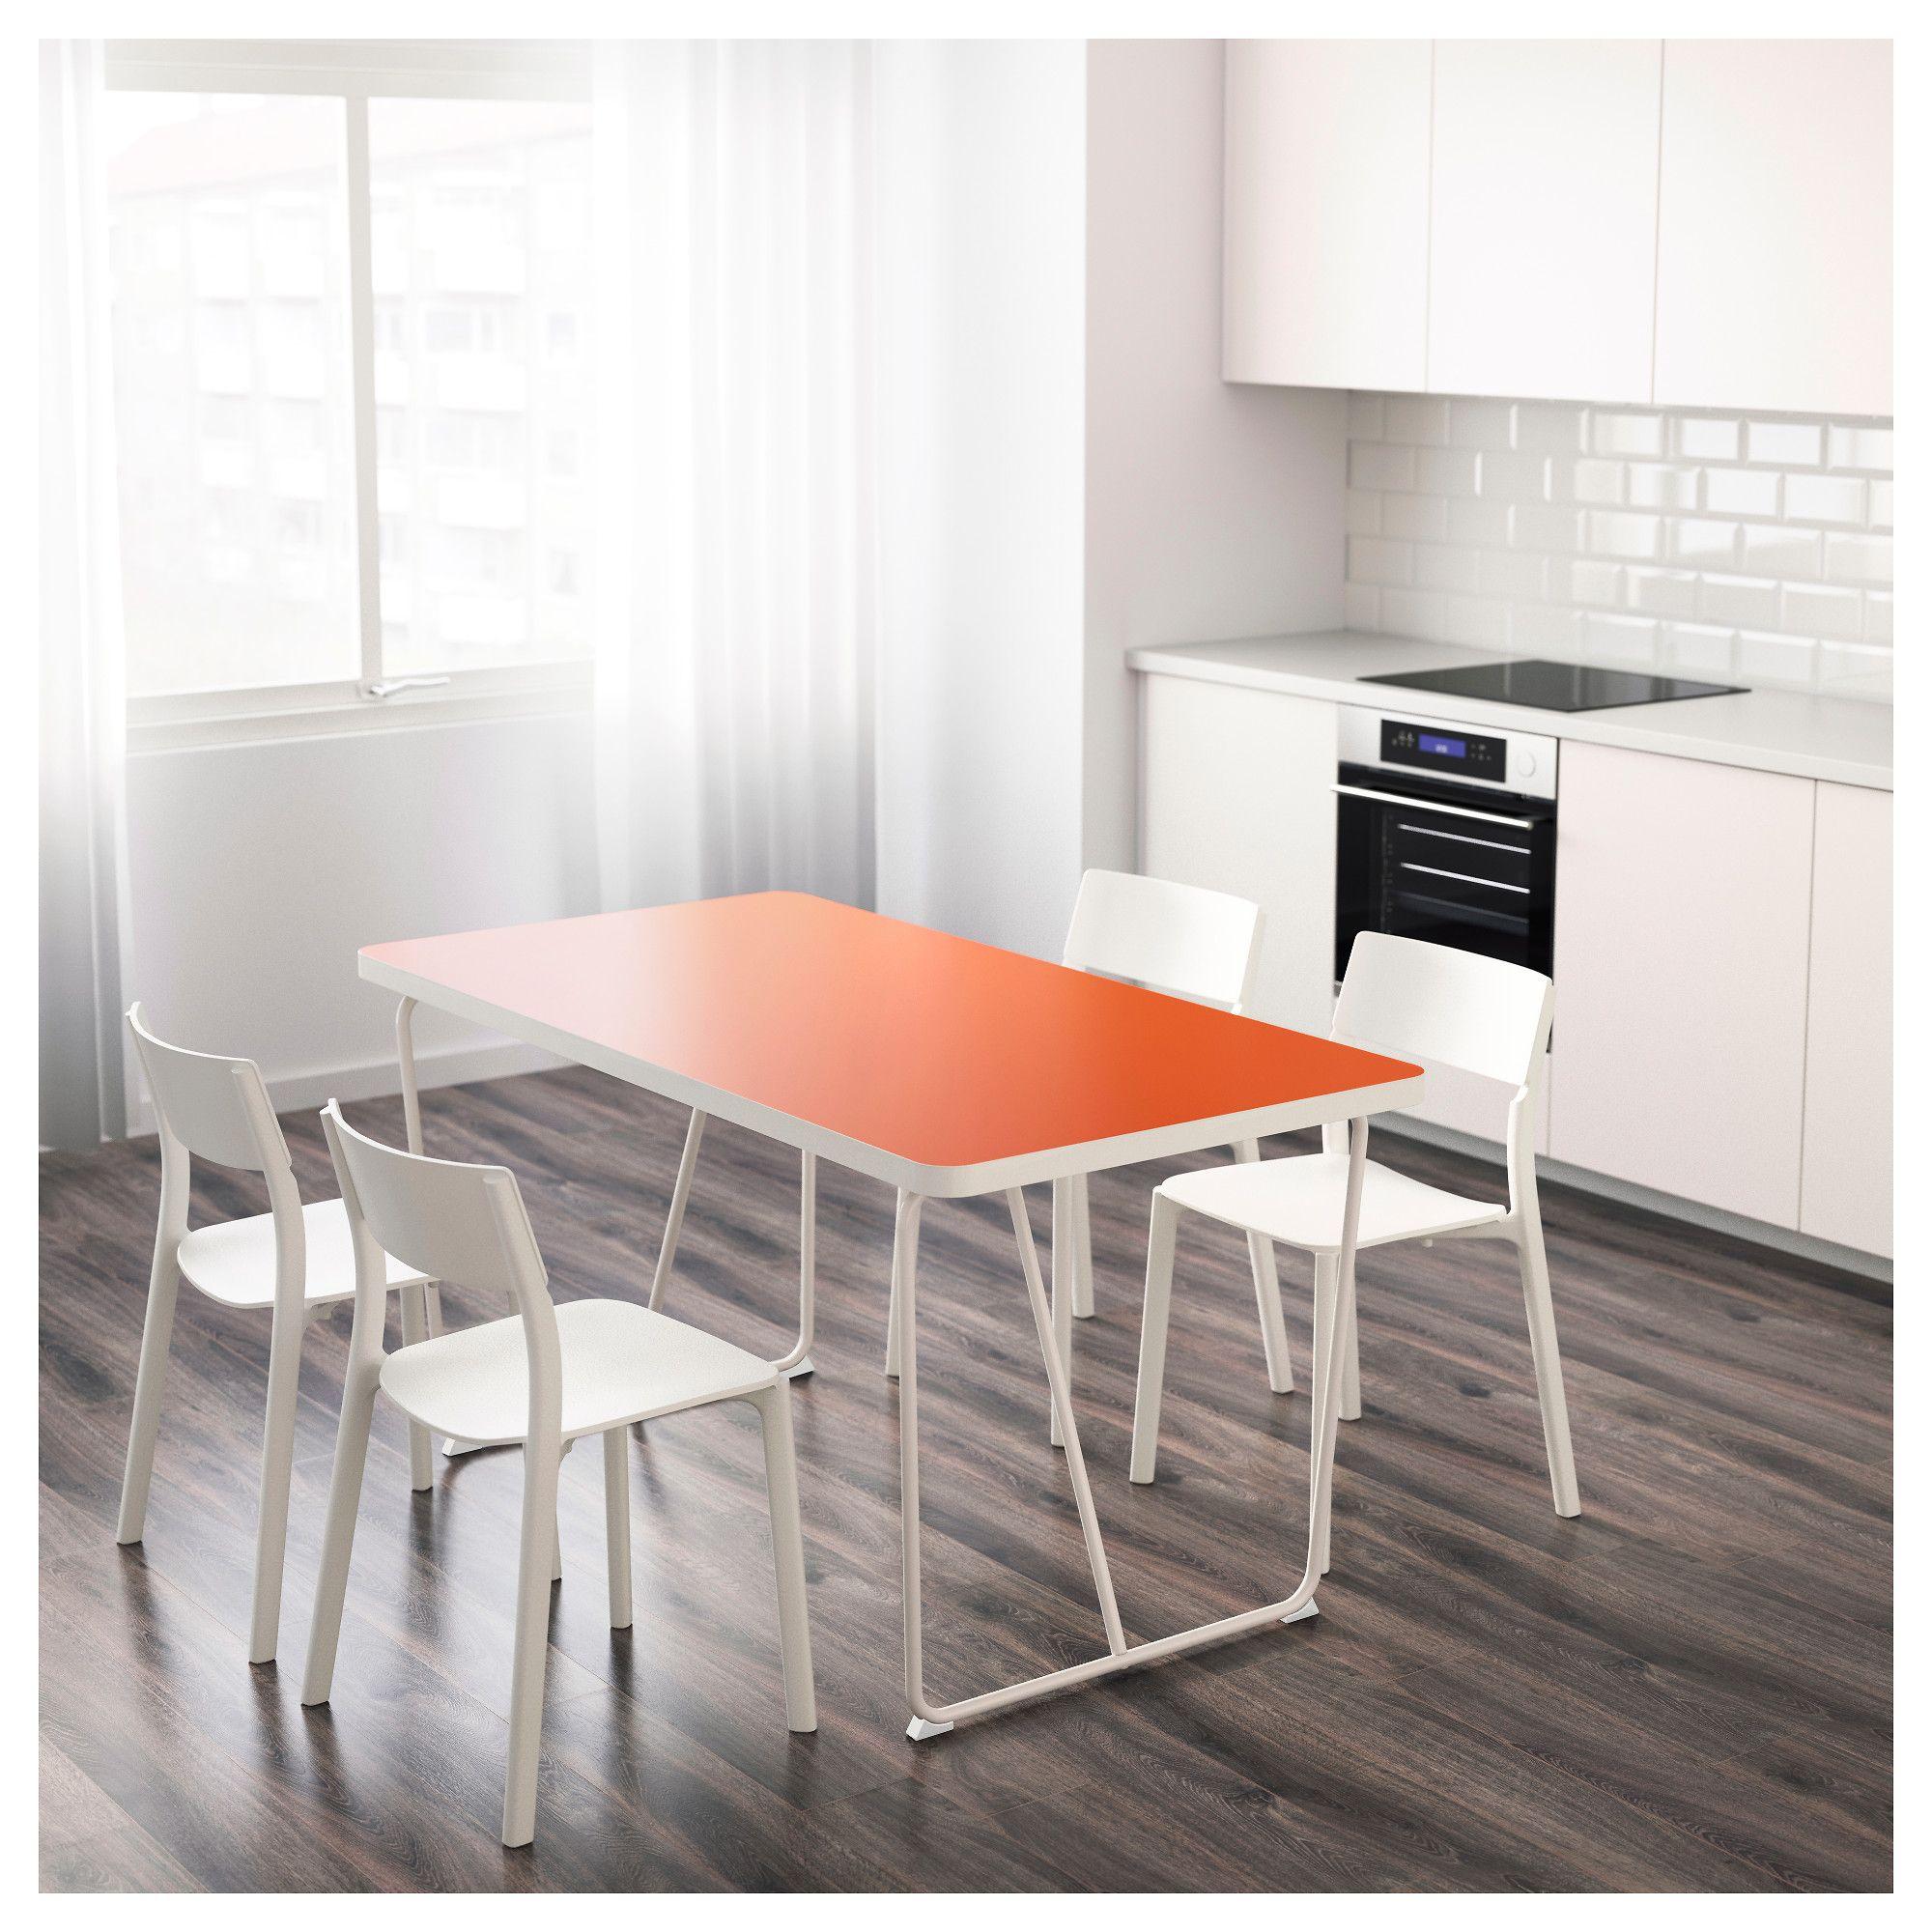 US Furniture and Home Furnishings | Furniture, Home